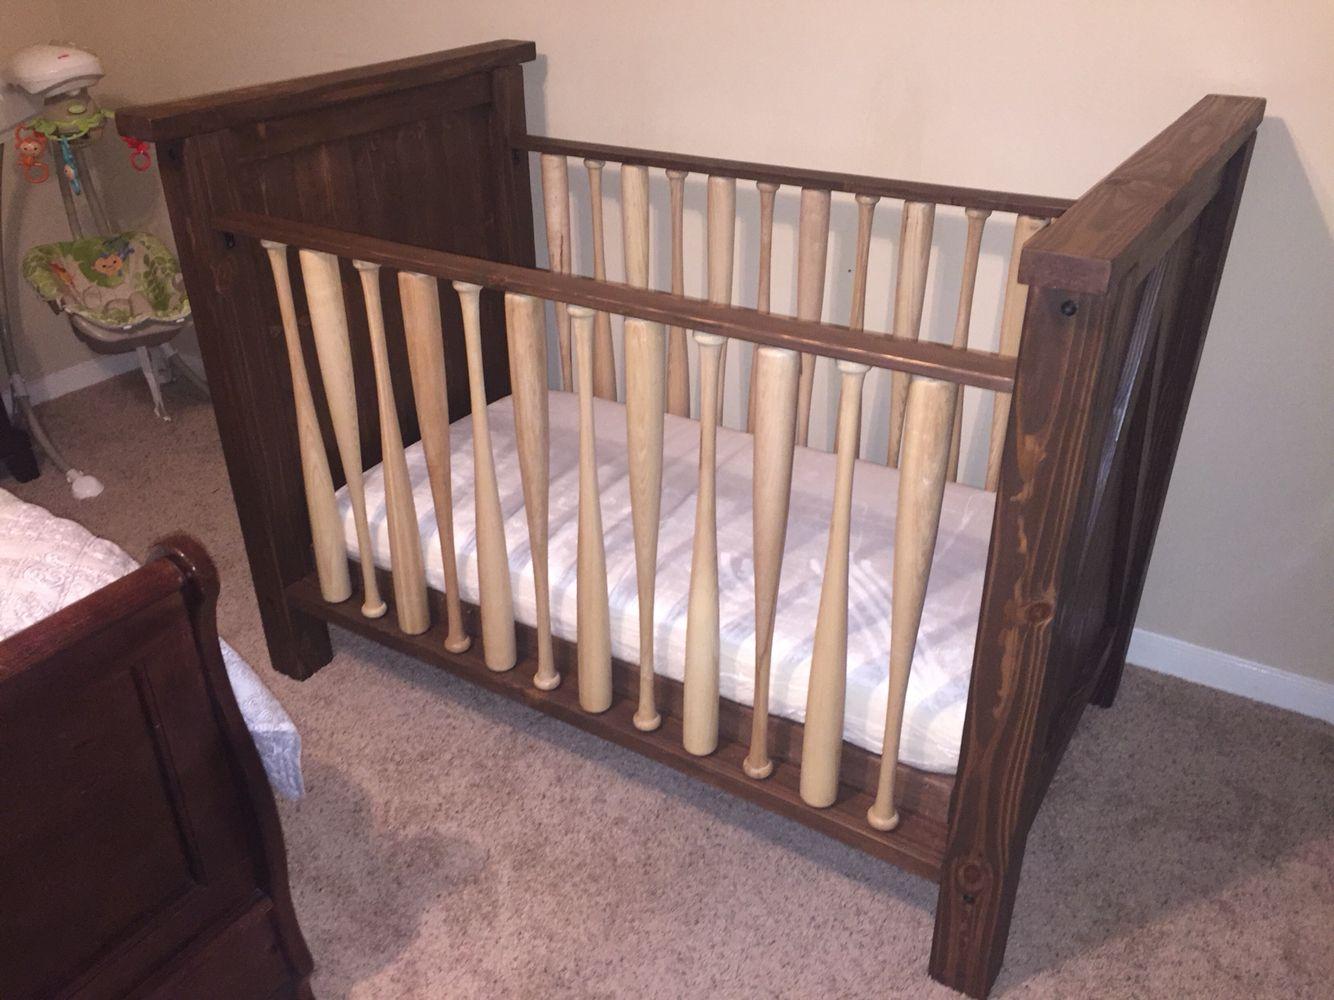 Crib for sale louisville ky - Baseball Bat Crib Hand Made Solid Wood Crib Made With Real Baseball Bats Can